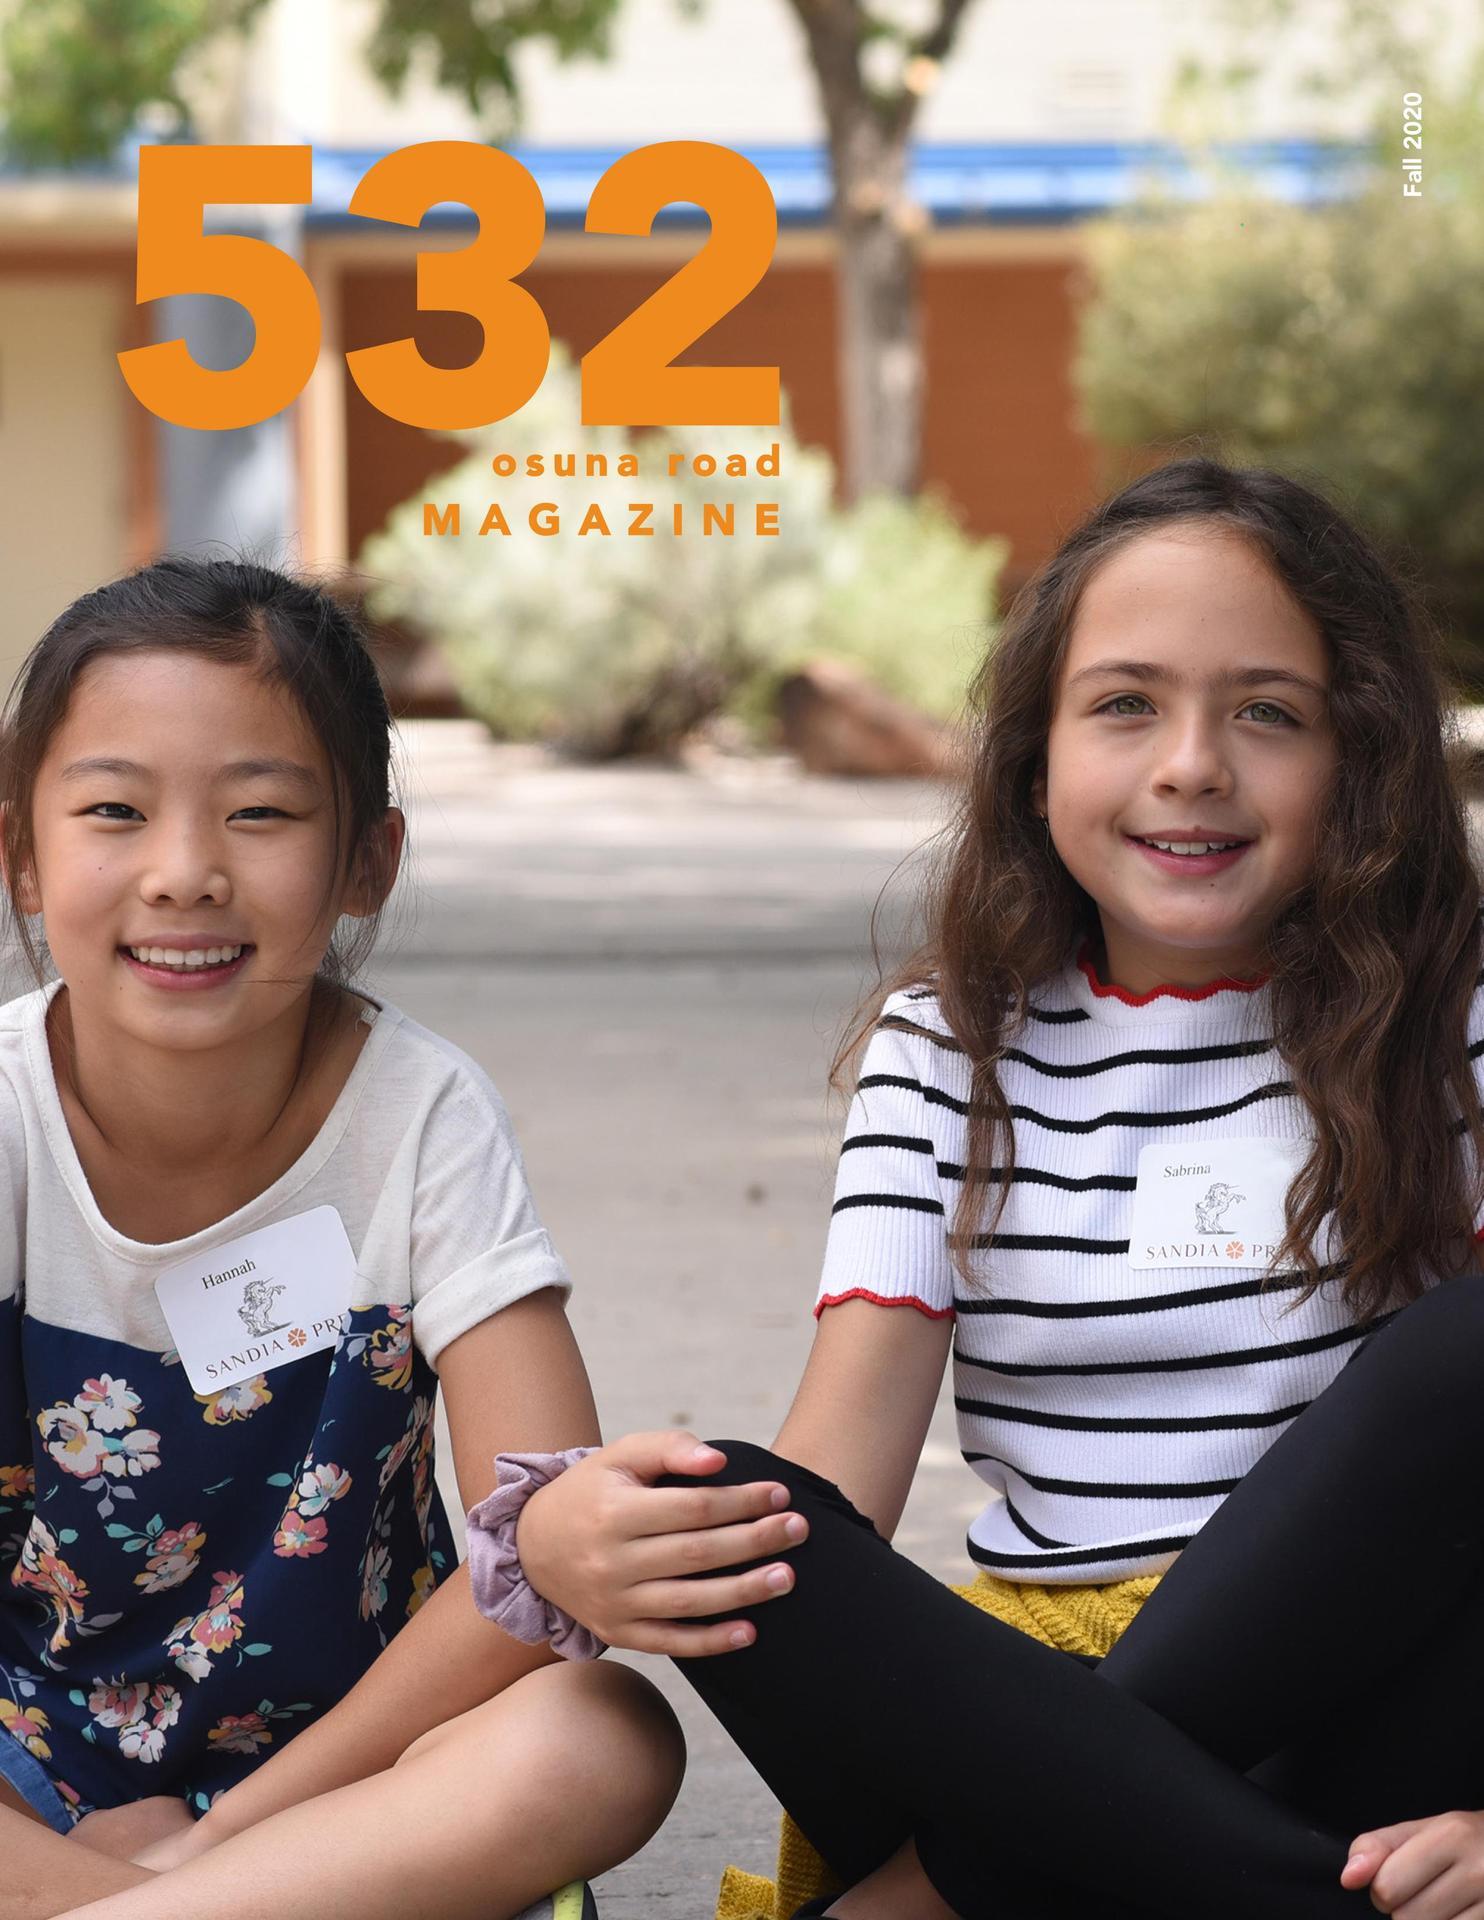 Fall 2020 - 532 Magazine - Sandia Prep